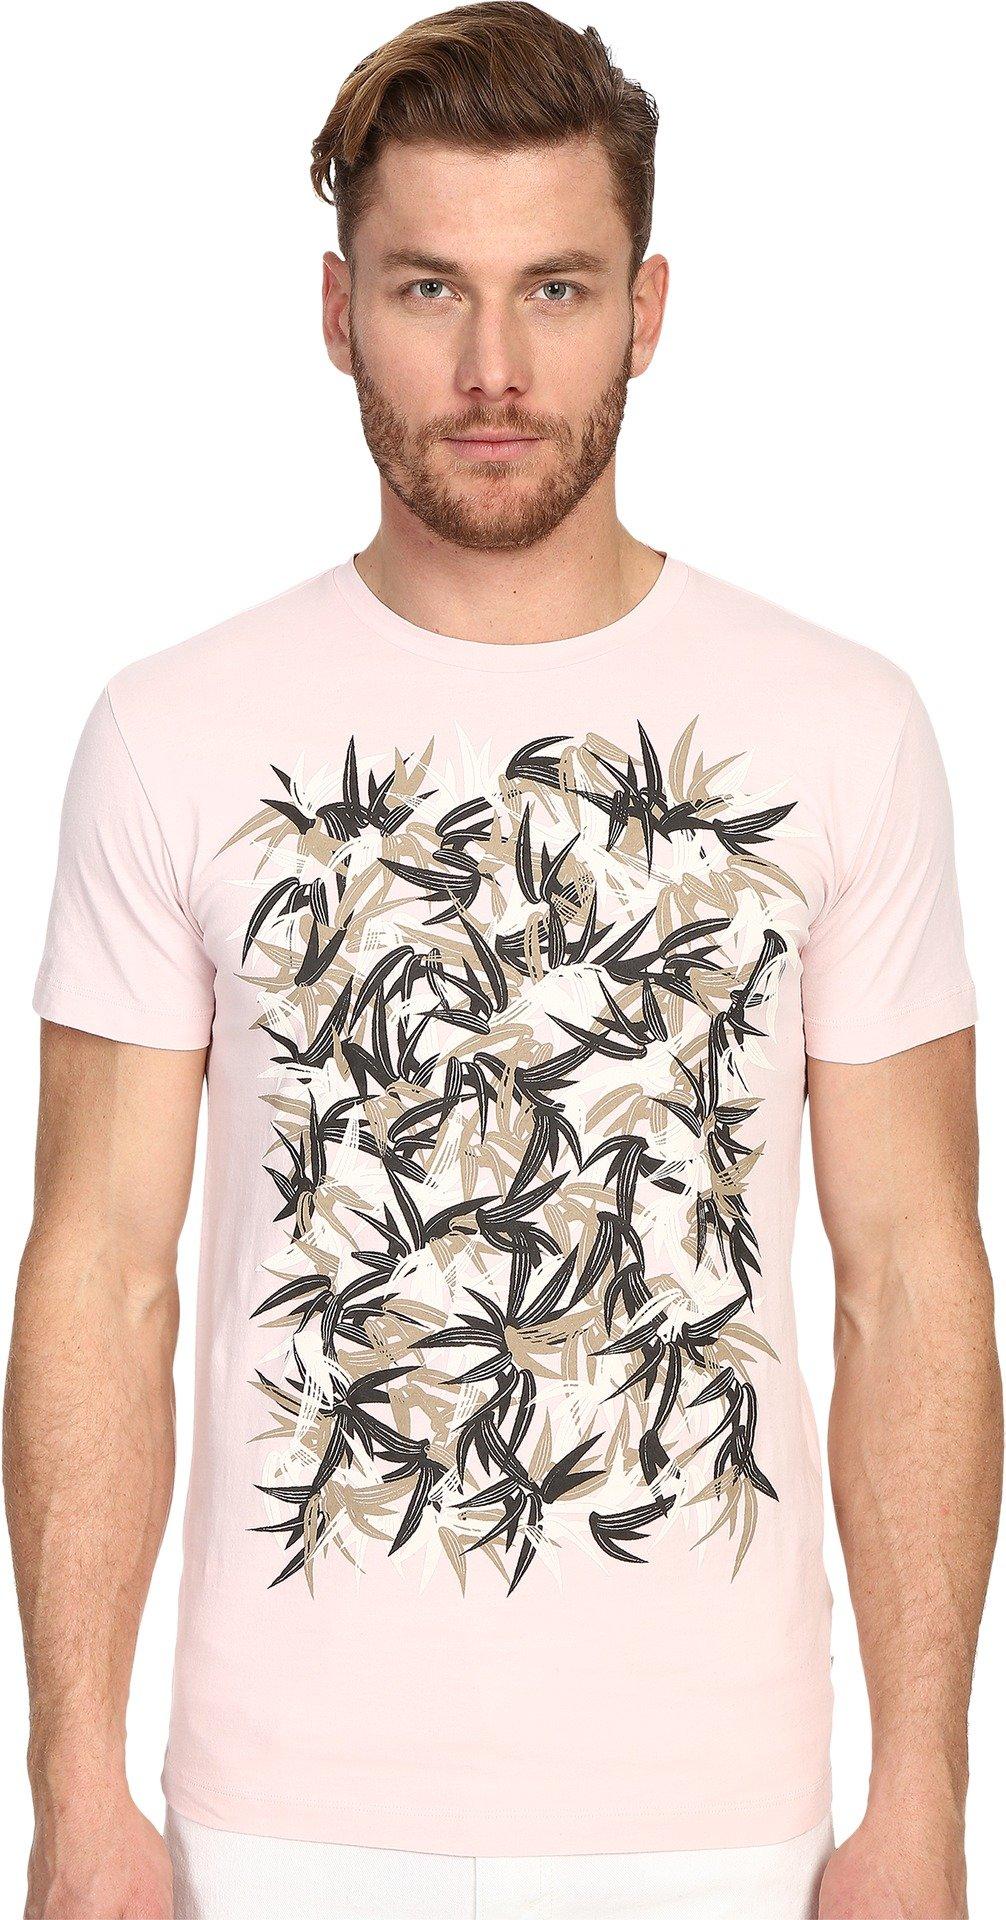 Marc Jacobs Men's Summer Graphic Slim Jersey T-Shirt, Pale Pink, 2XL